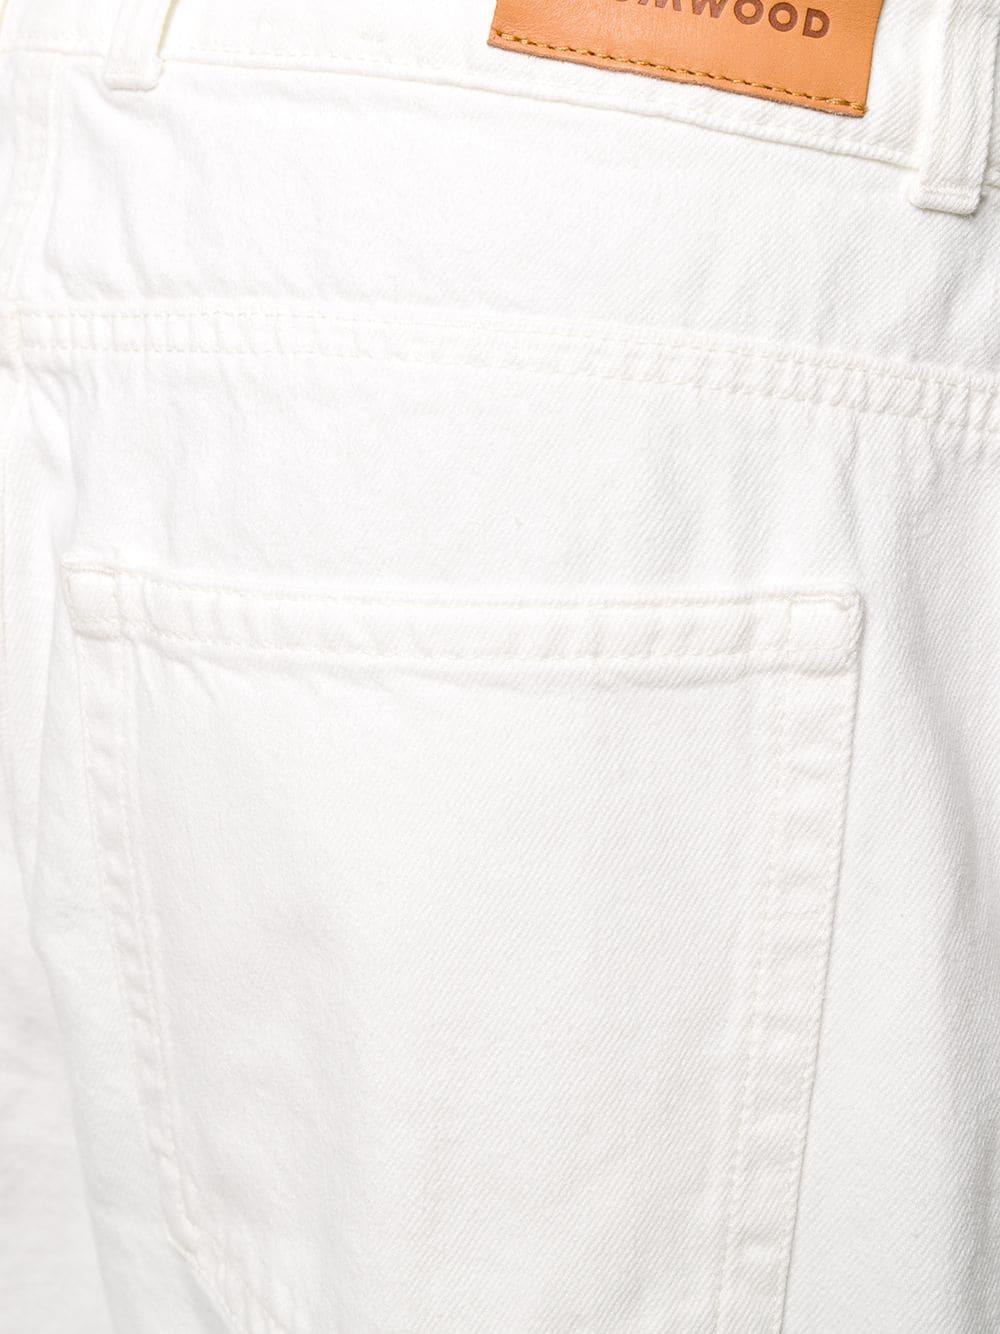 TOM WOOD TOM WOOD | Jeans | 40619064